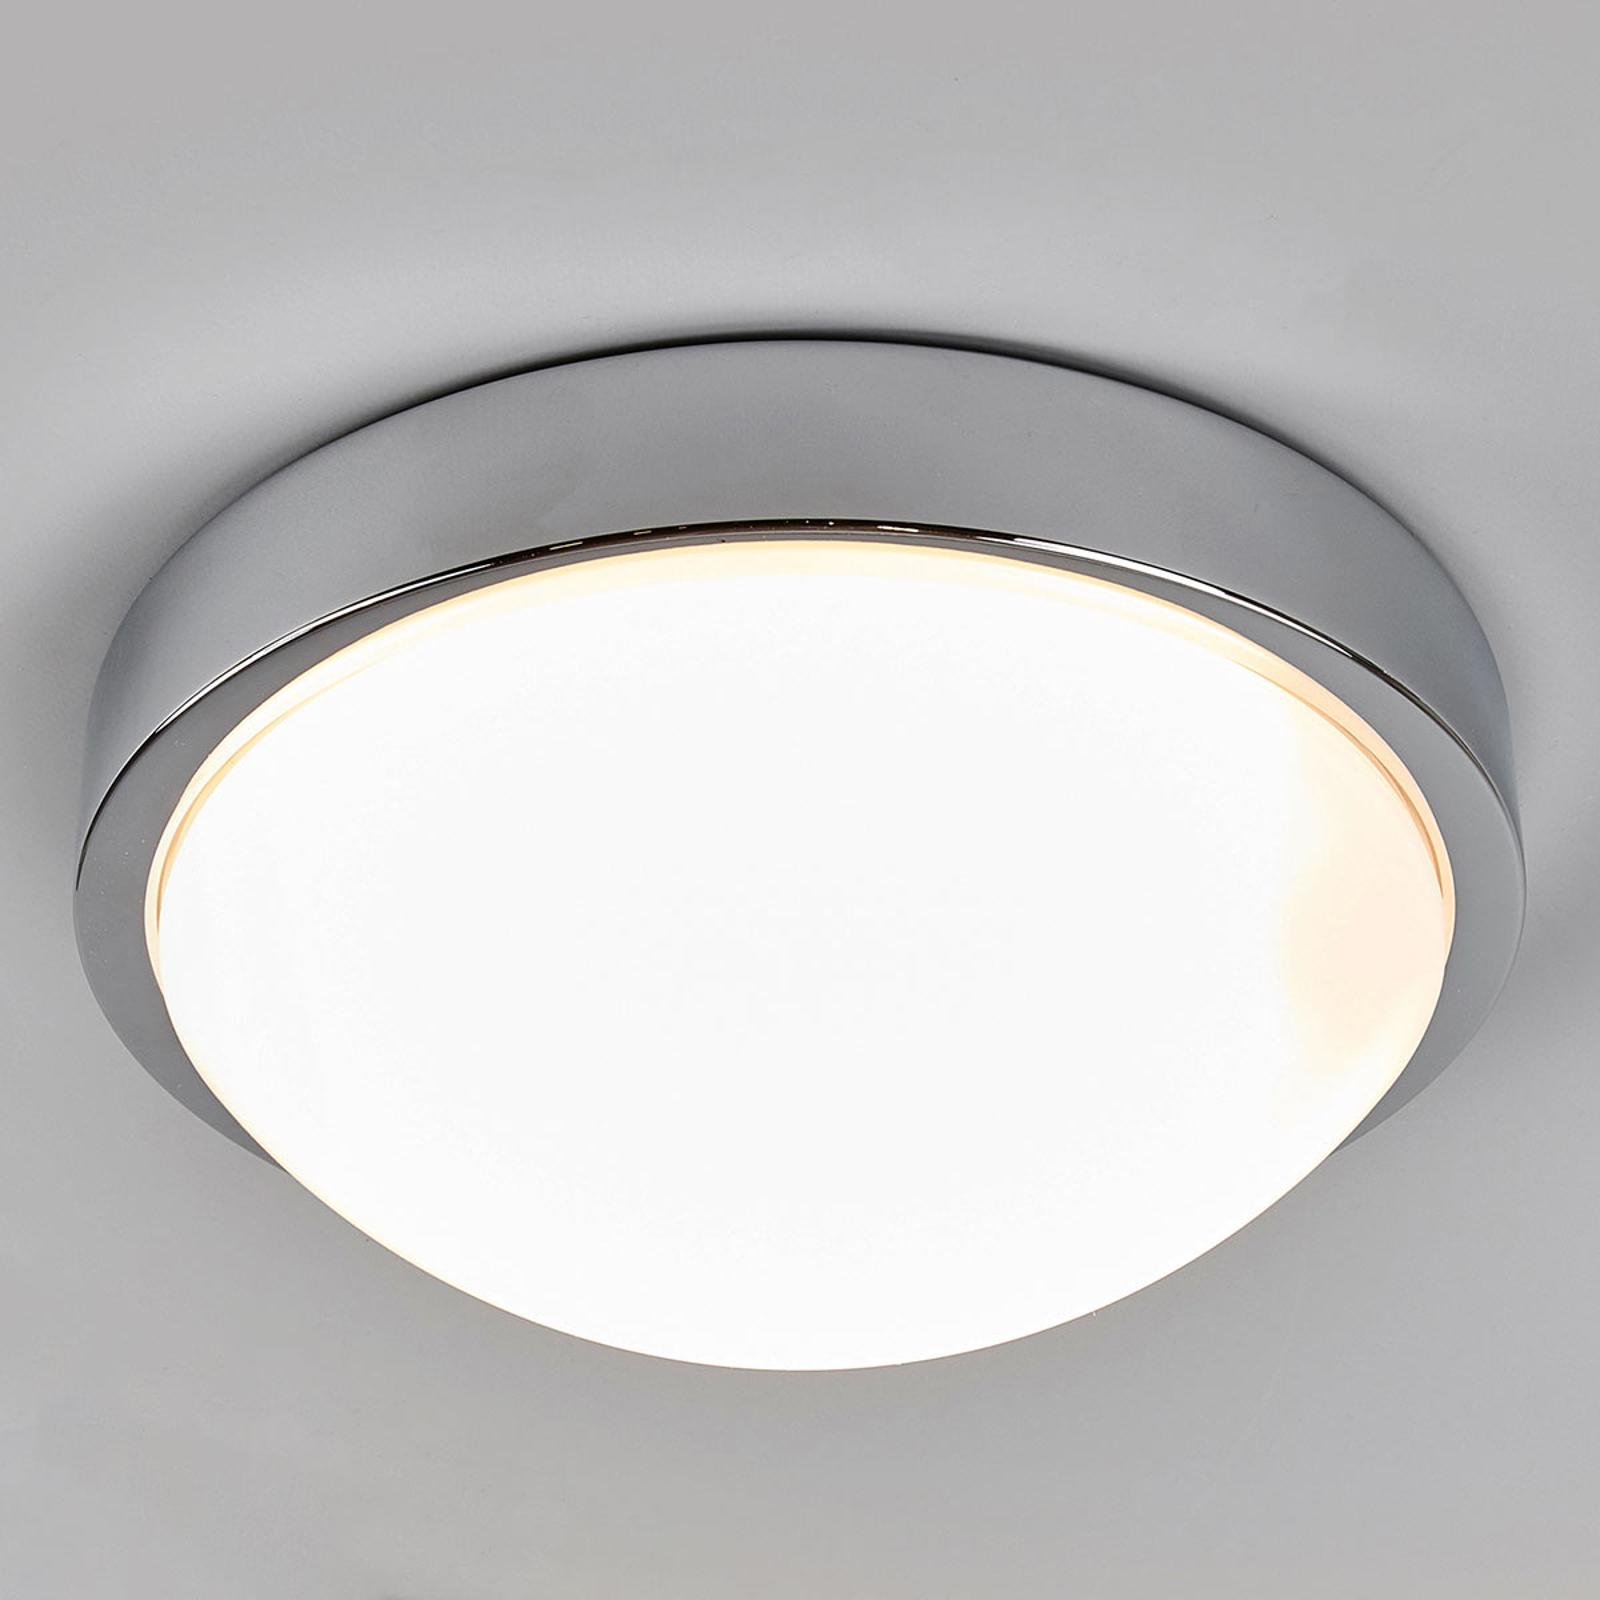 Verchroomde badkamerplafondlamp Elucio, IP44